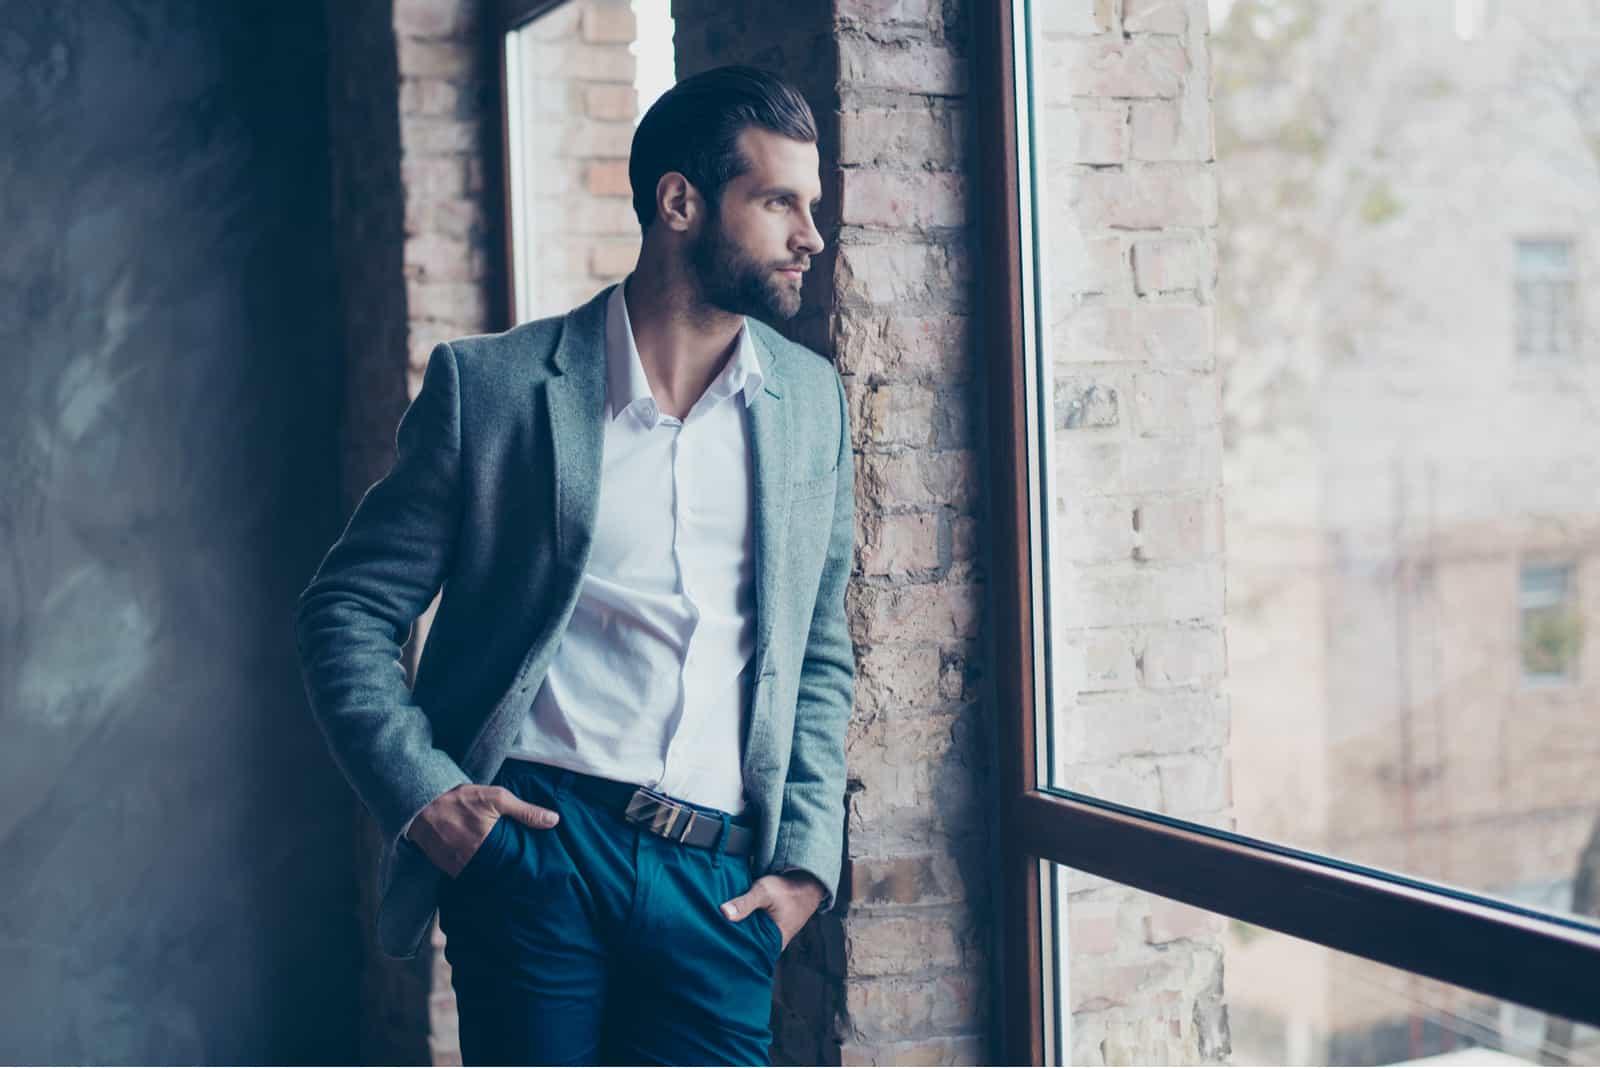 bärtiger Mann steht am Fenster